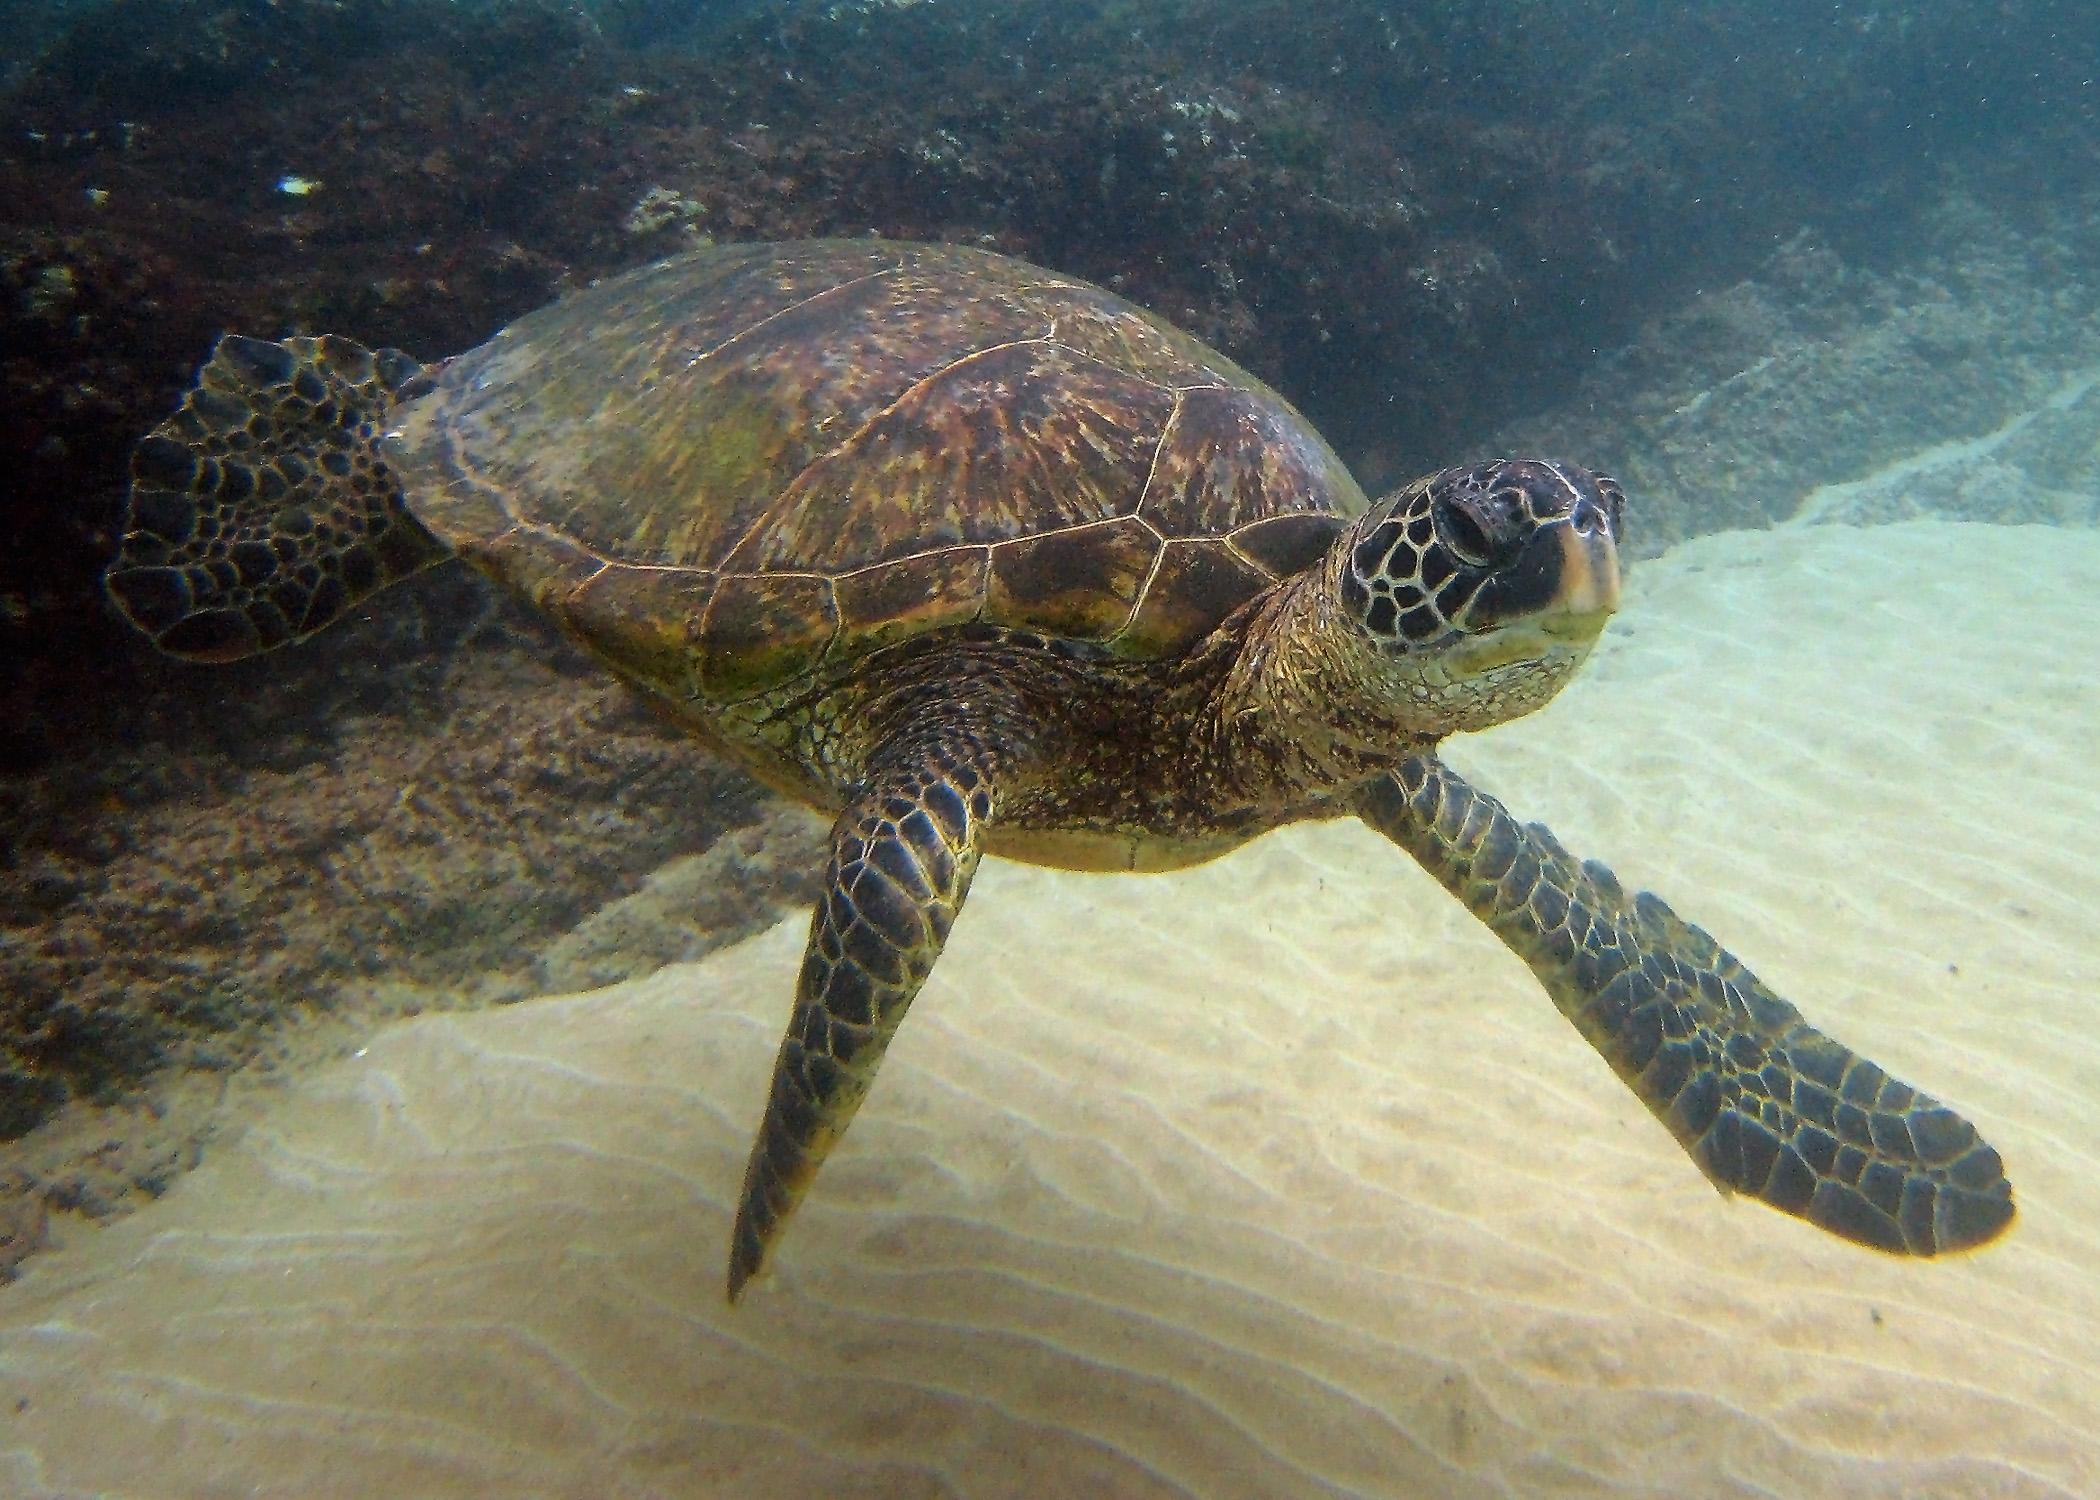 Green Sea Turtle at Maluaka Beach